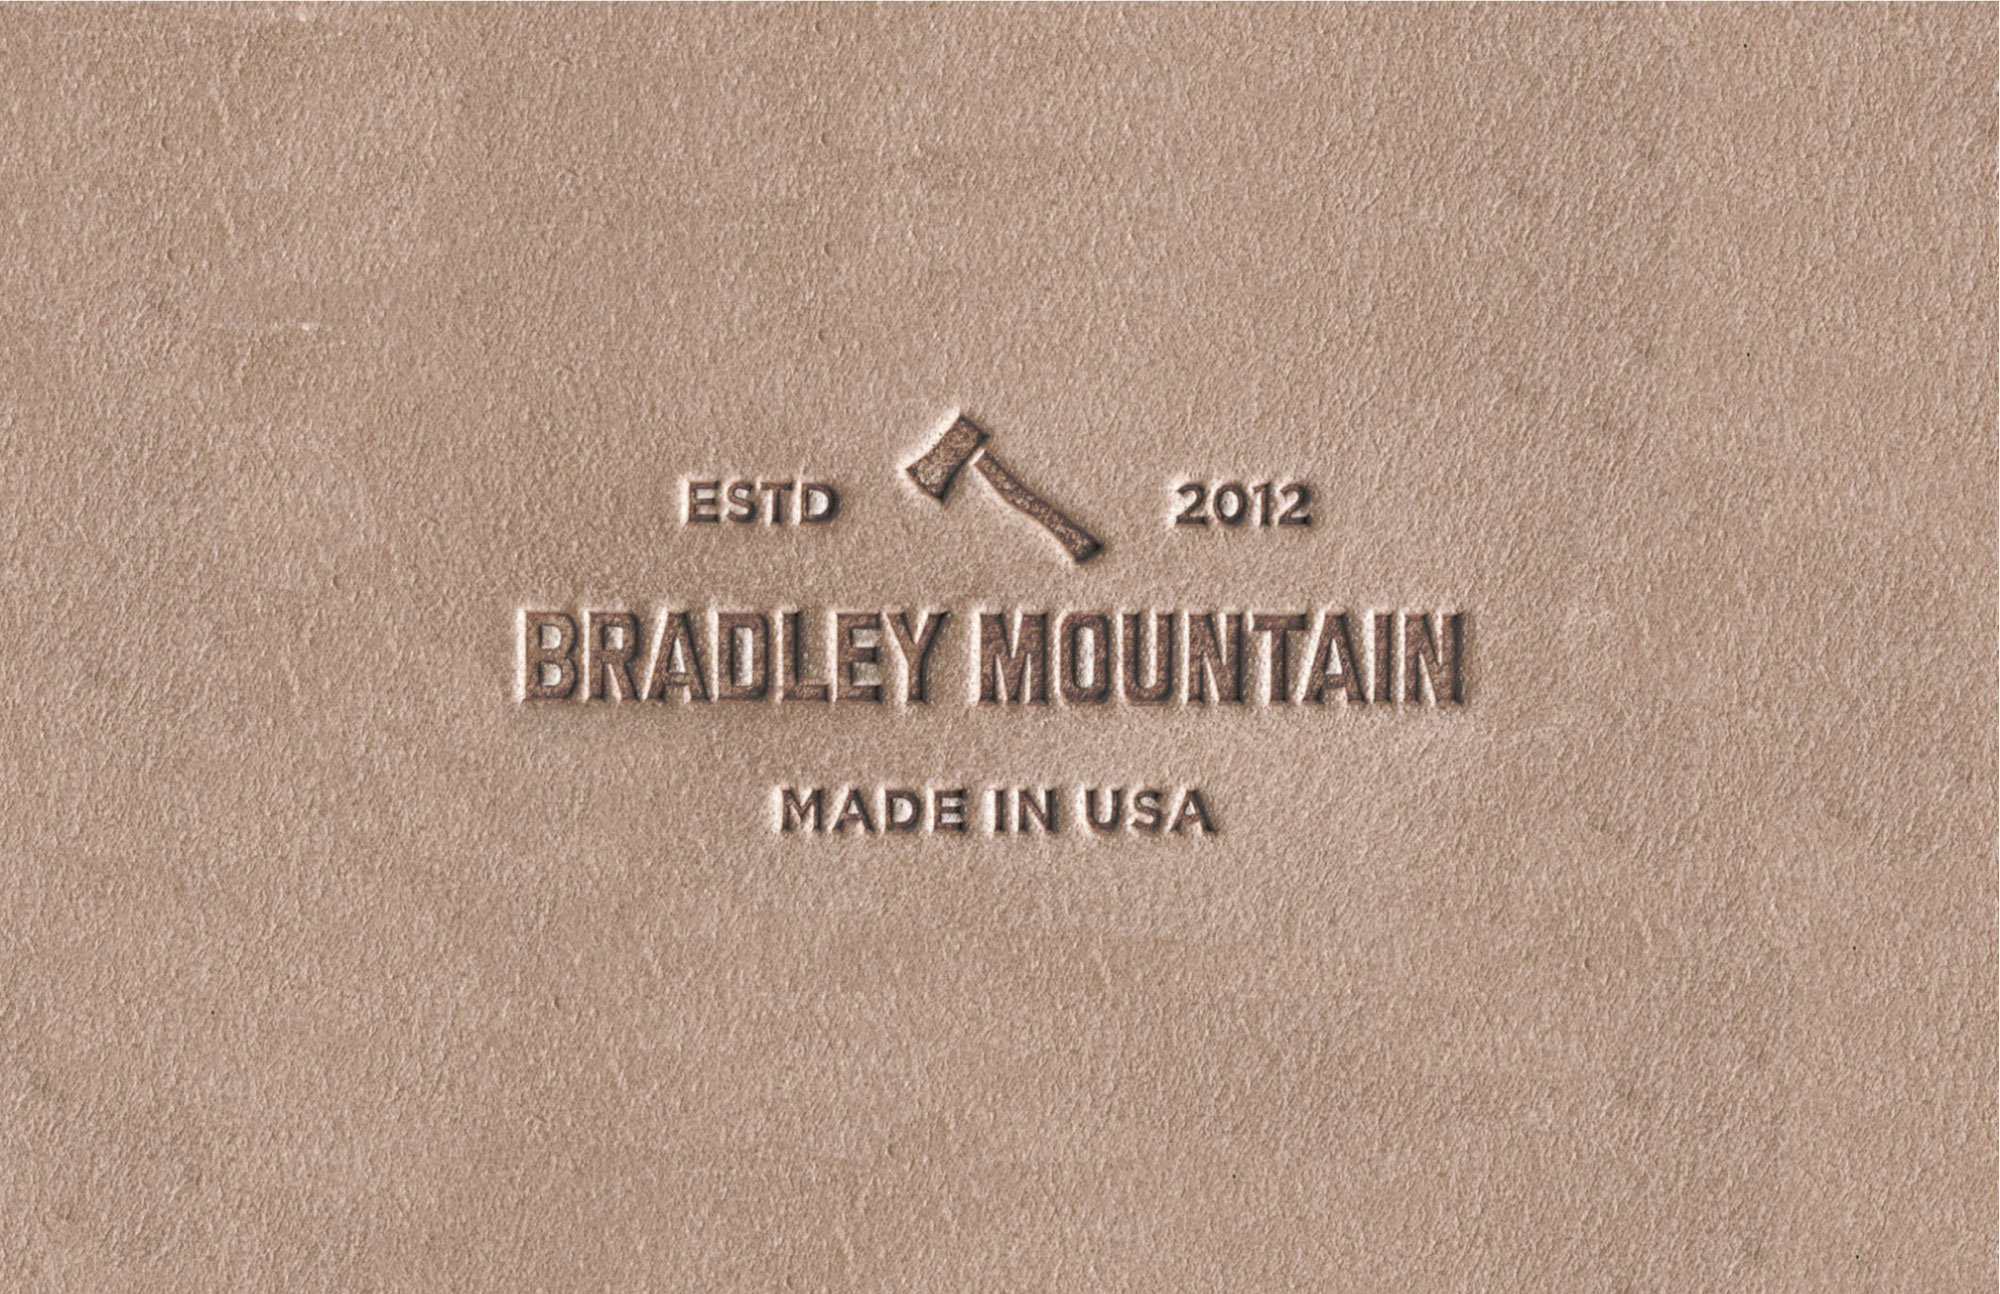 bradley-mountain-logo.jpg